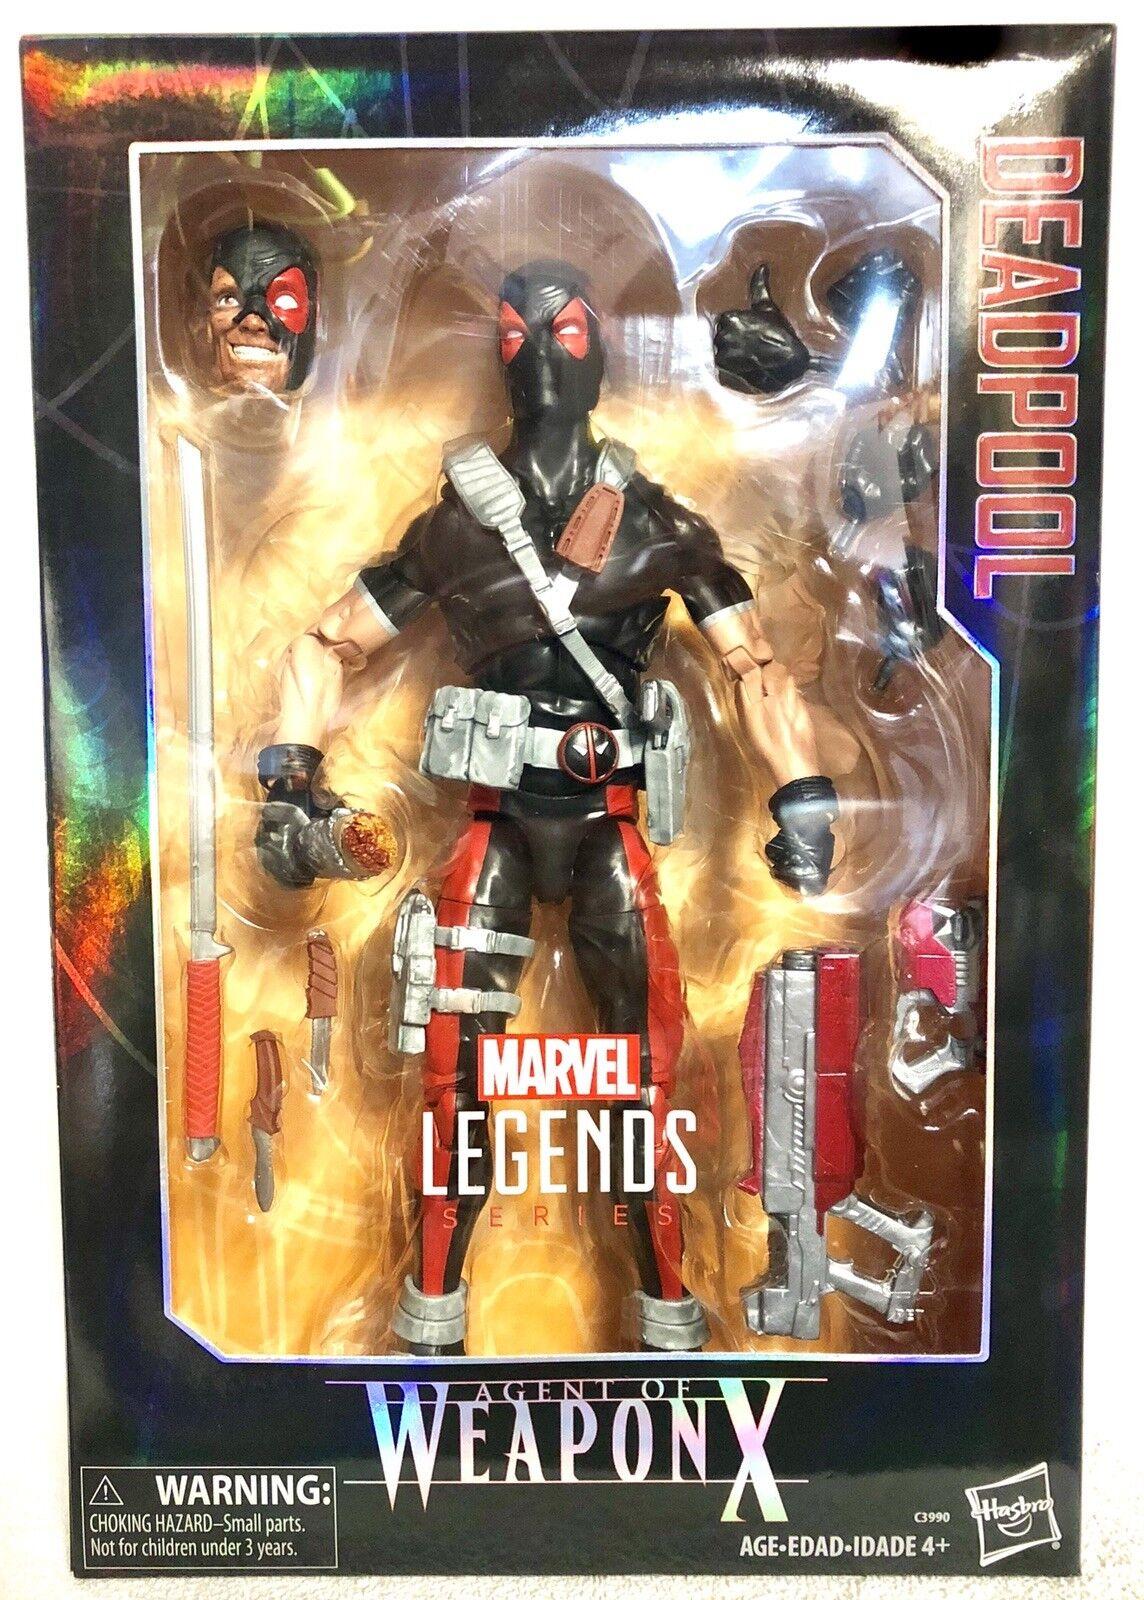 Marvel - legenden fr deadpool deluxe - actionfigur agent waffe x